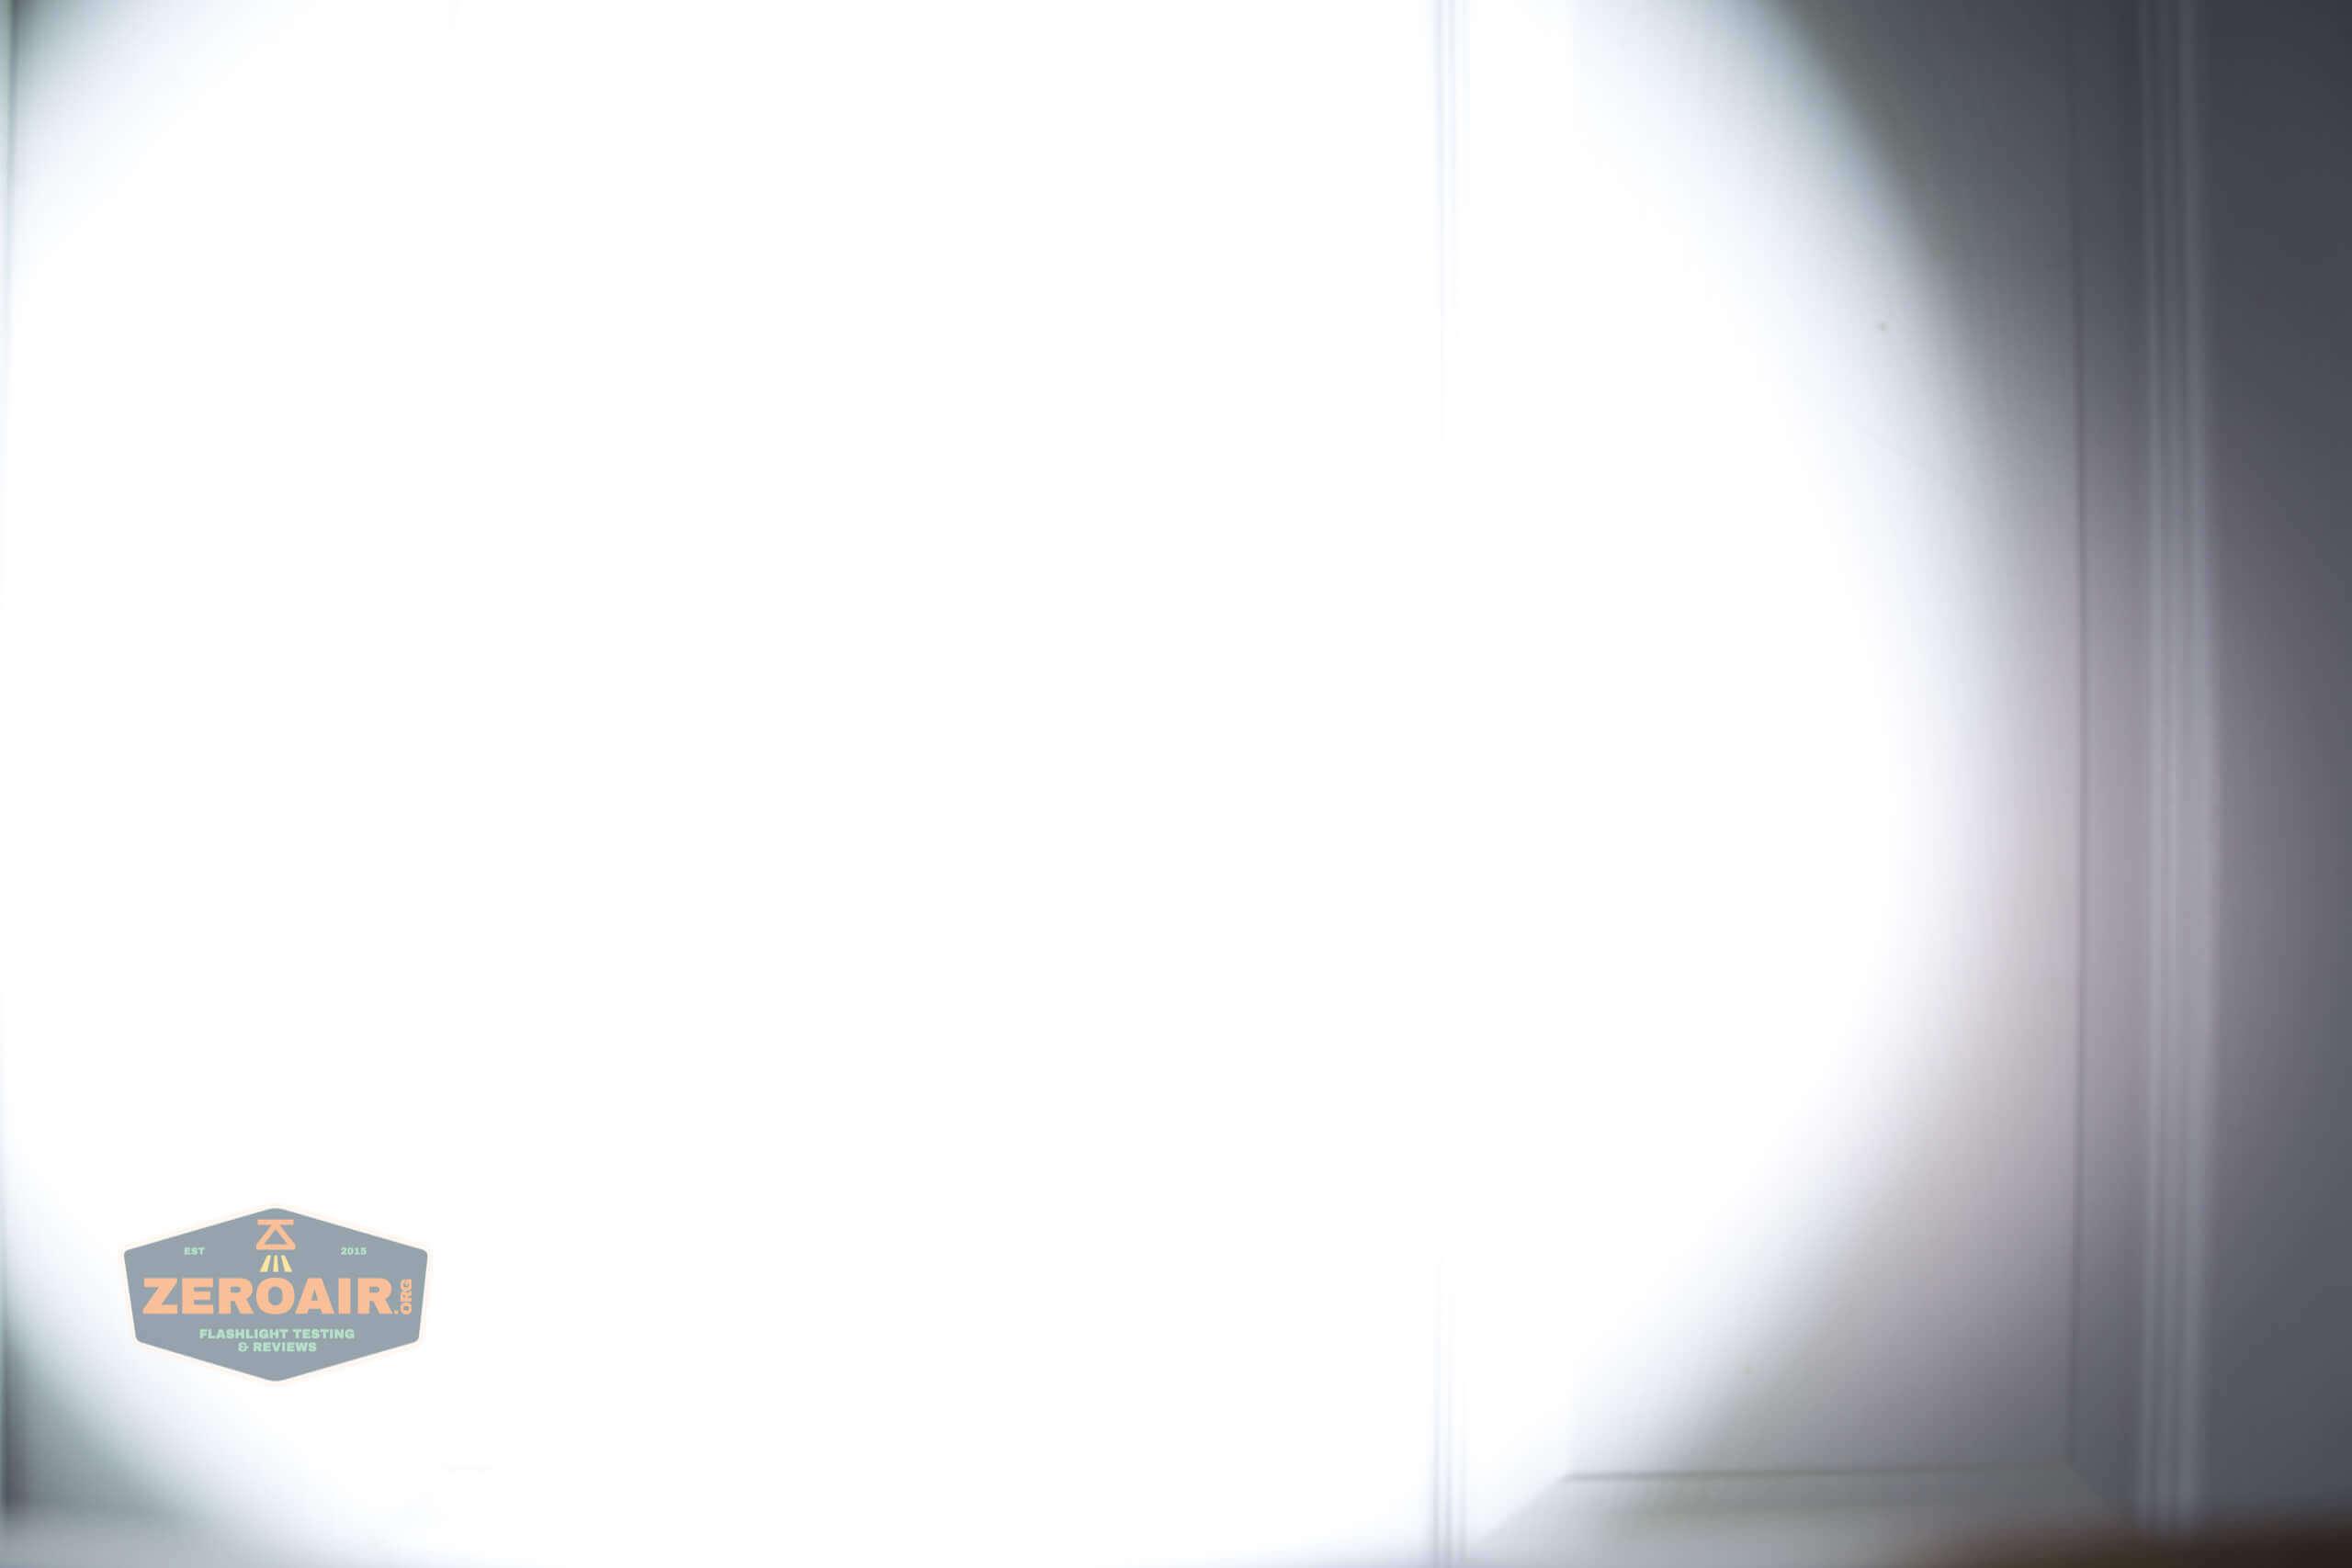 skilhunt m300 18650 flashlight beamshot door 8